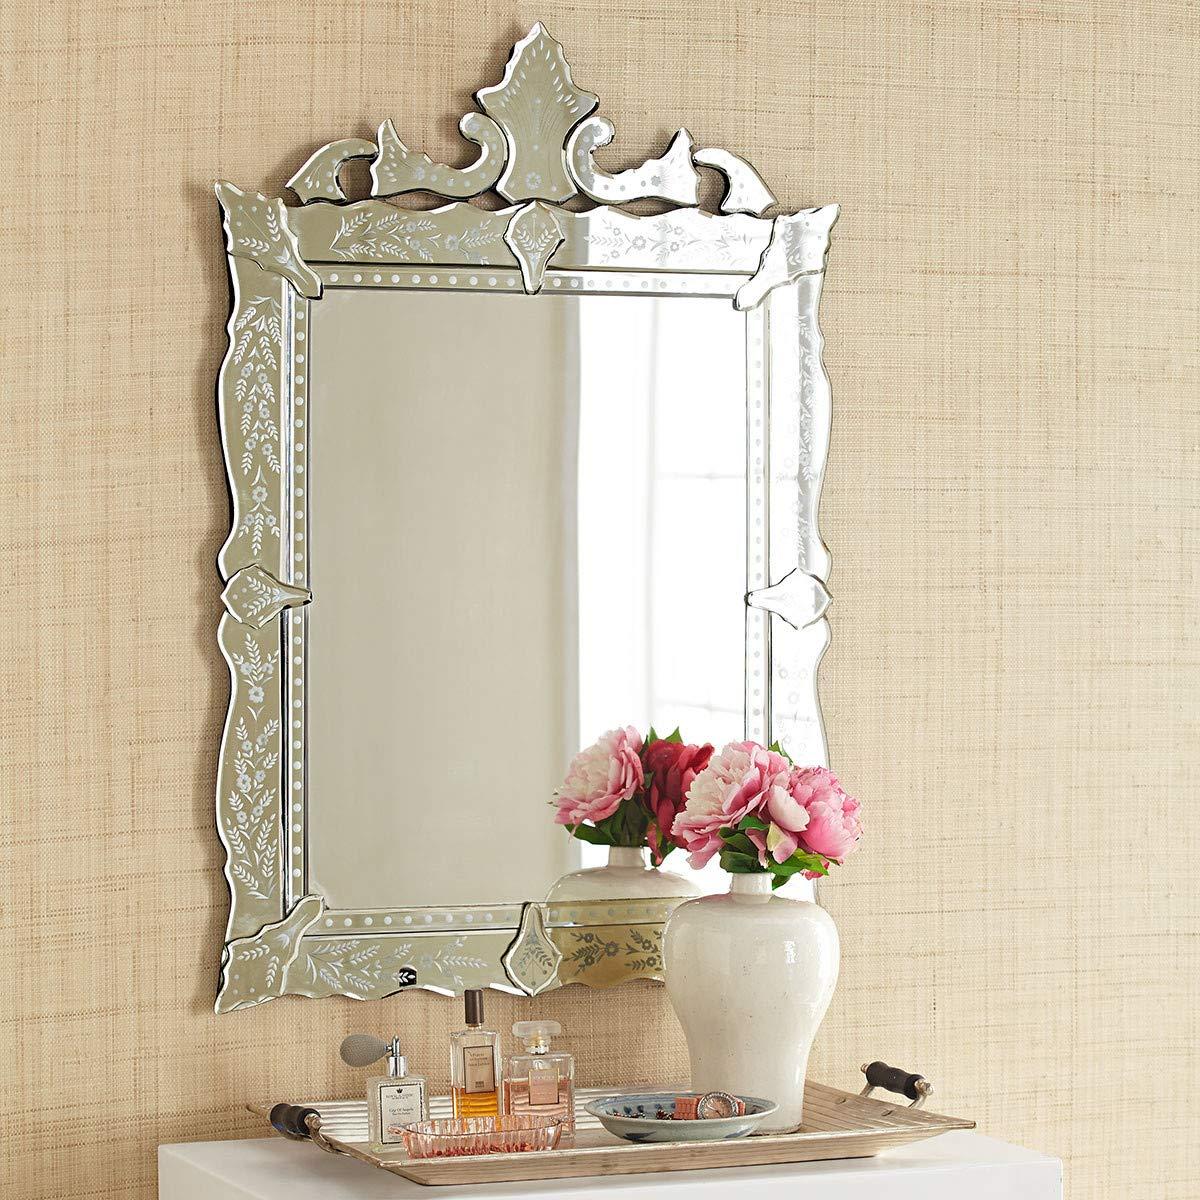 KOHROS Wall Mounted Squared Mirror, Venetian Mirror Decor for The Living Room, Bathroom, Bedroom (W 28'' x H 40'' Rectangle) by KOHROS